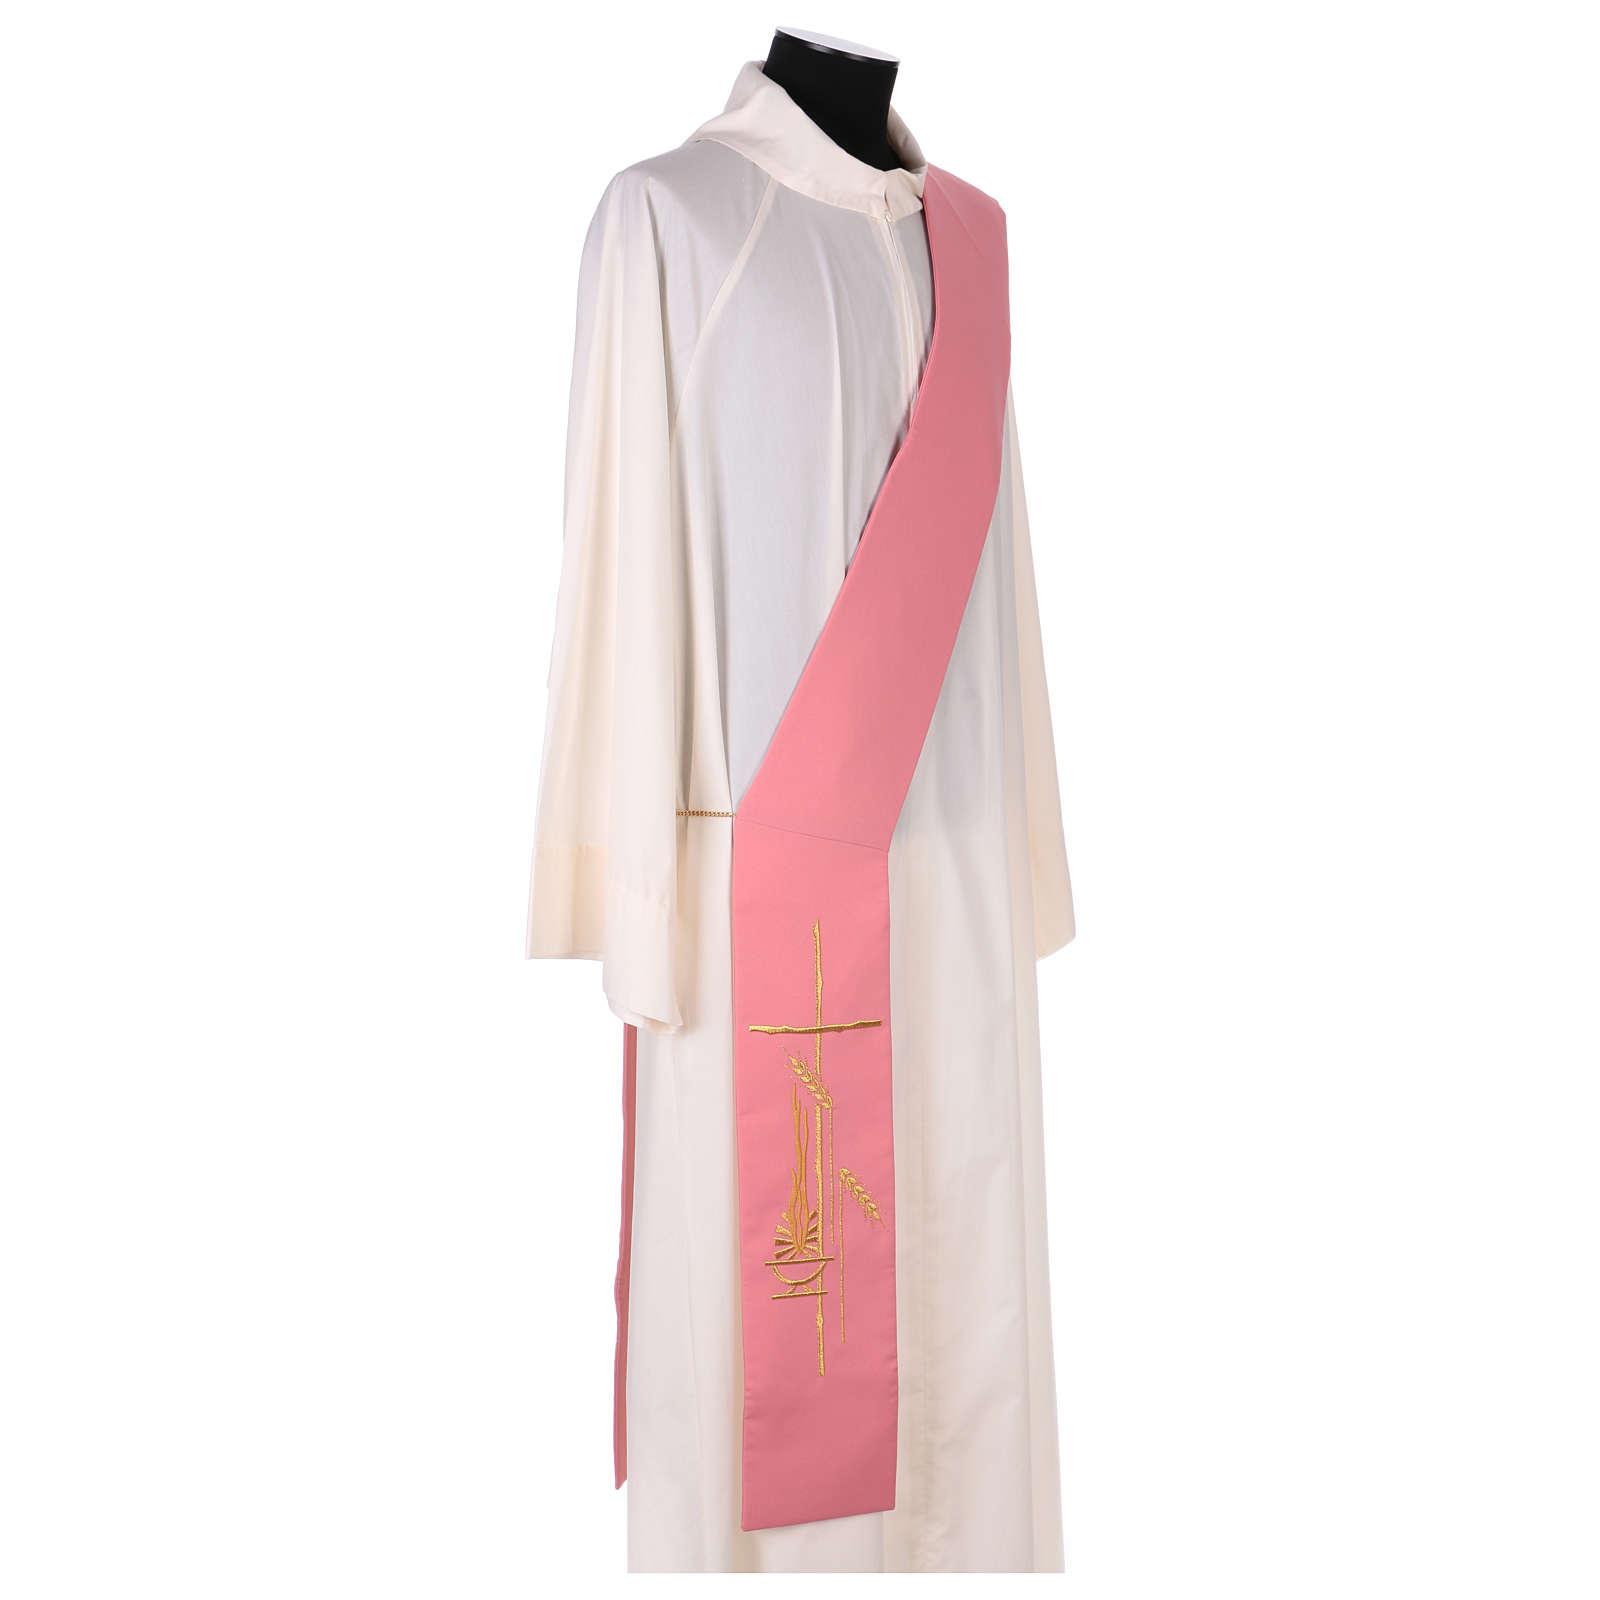 Stola diaconale rosa 100% poliestere lampada croce 4